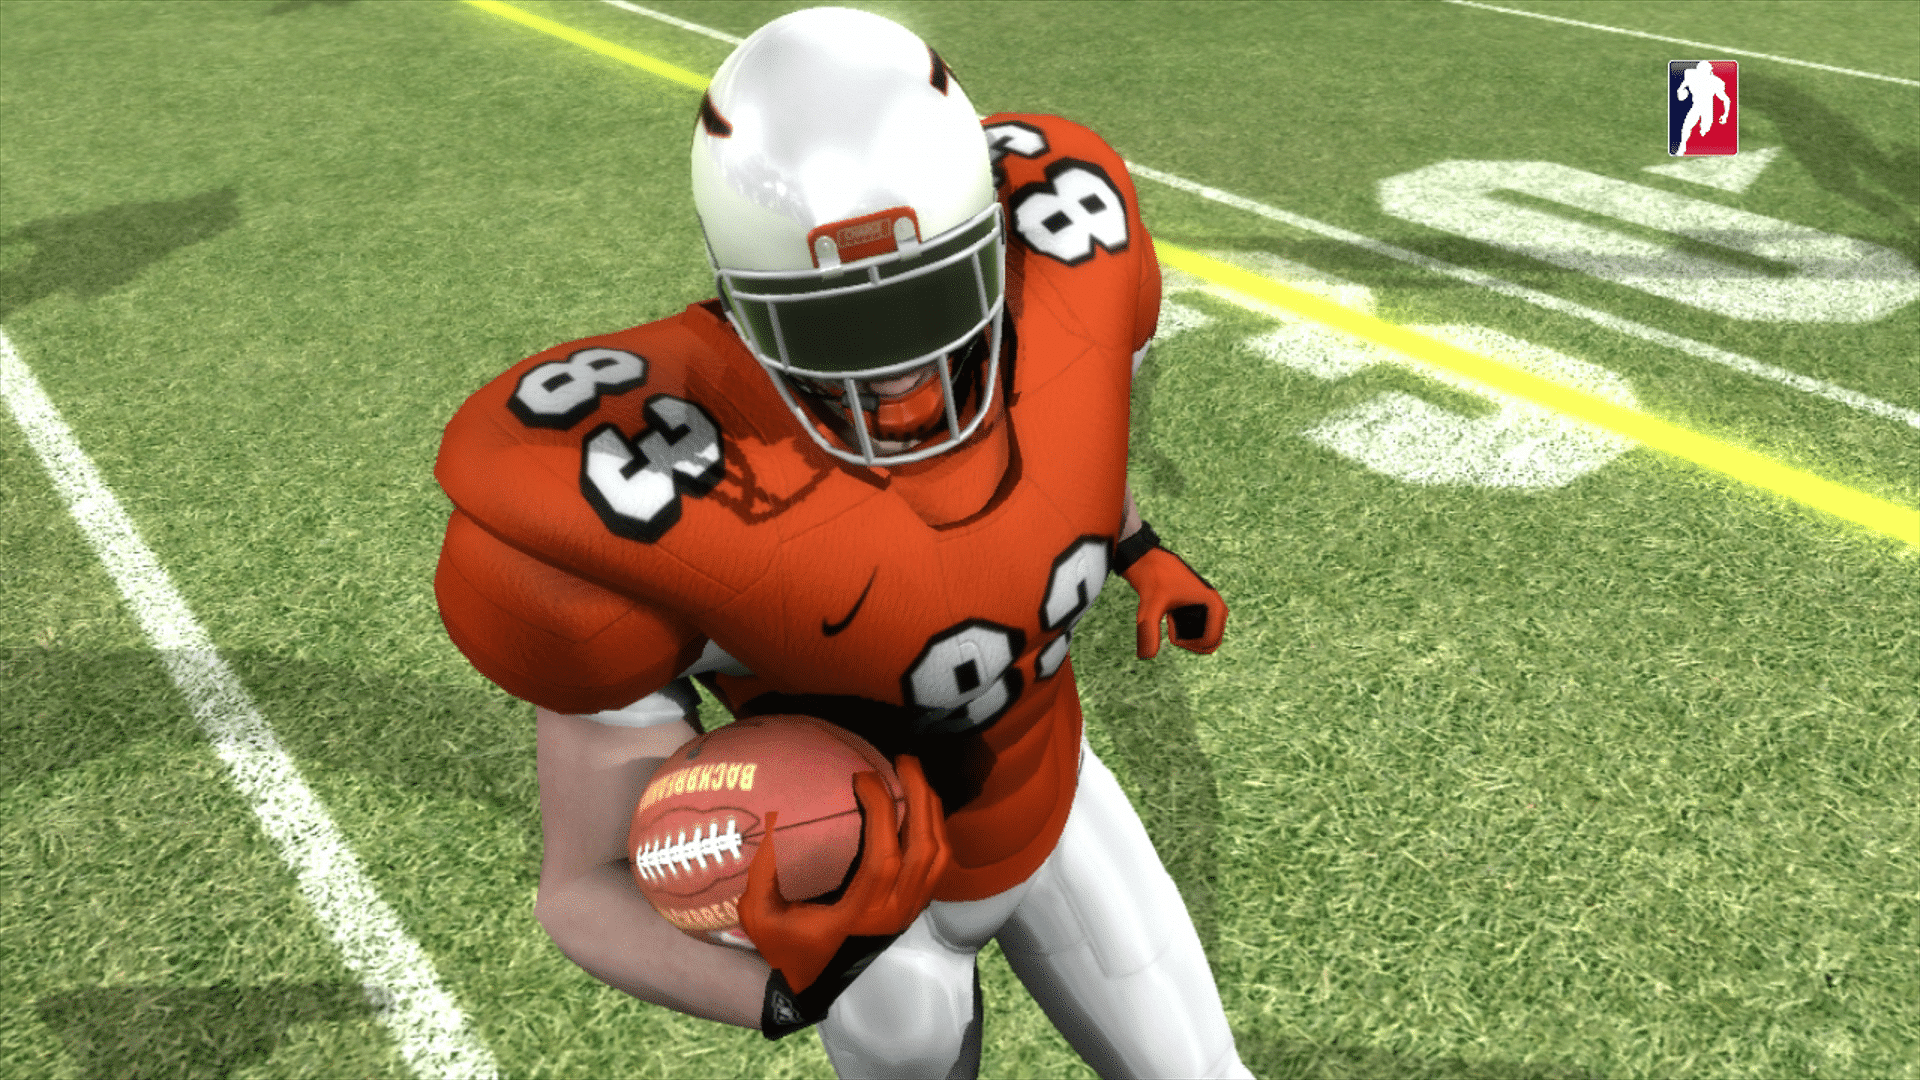 Texas Bruisers Added To The Backbreaker Football League